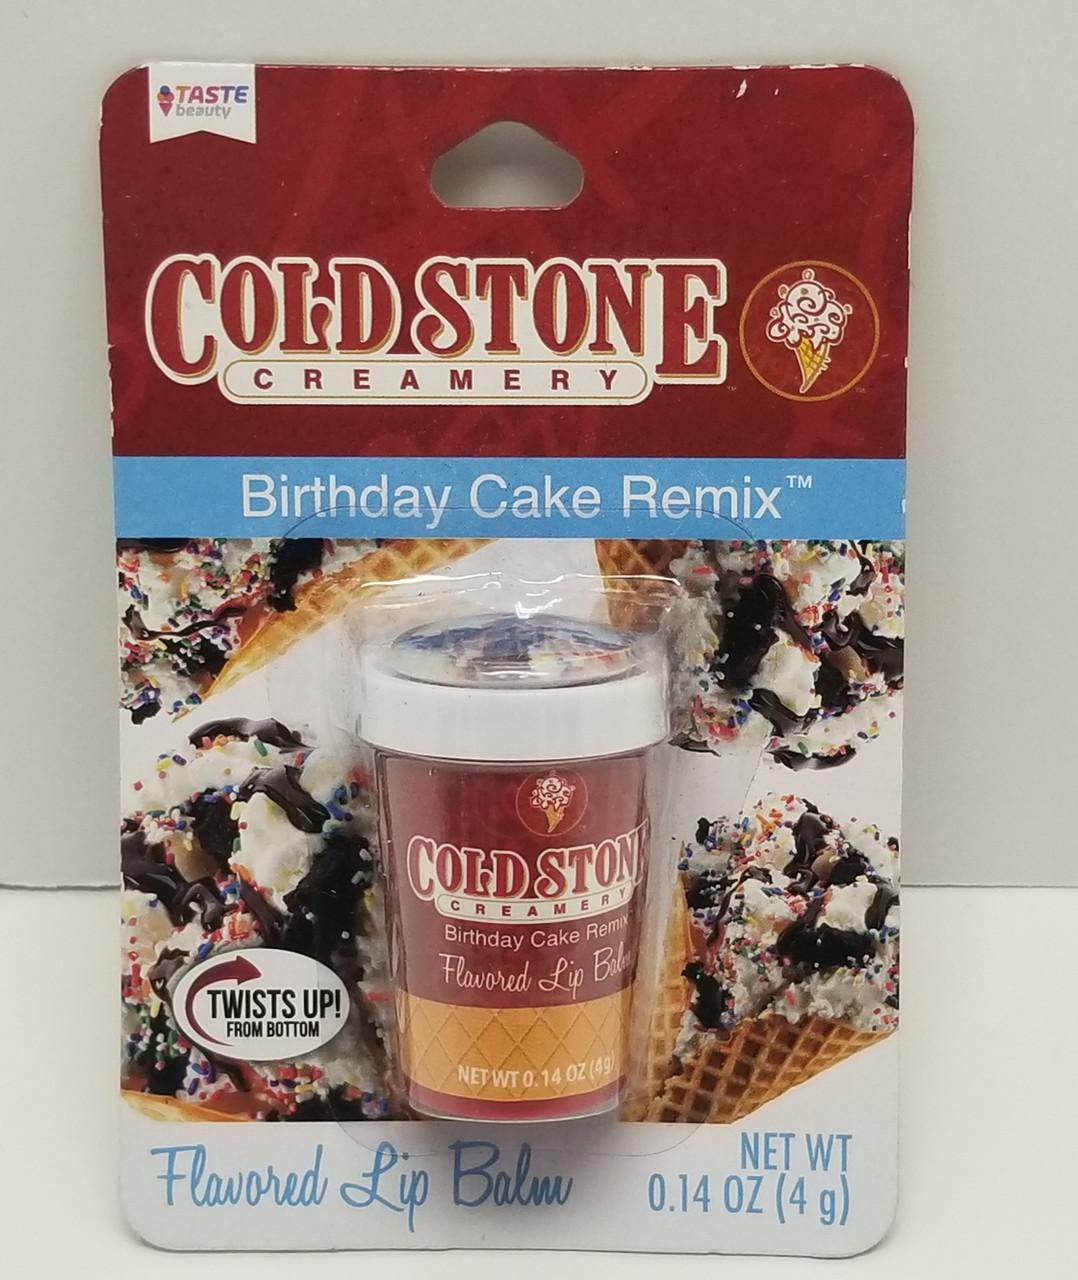 Incredible Cold Stone Creamery Birthday Cake Remix Flavored Lip Balm 0 14Oz Funny Birthday Cards Online Alyptdamsfinfo